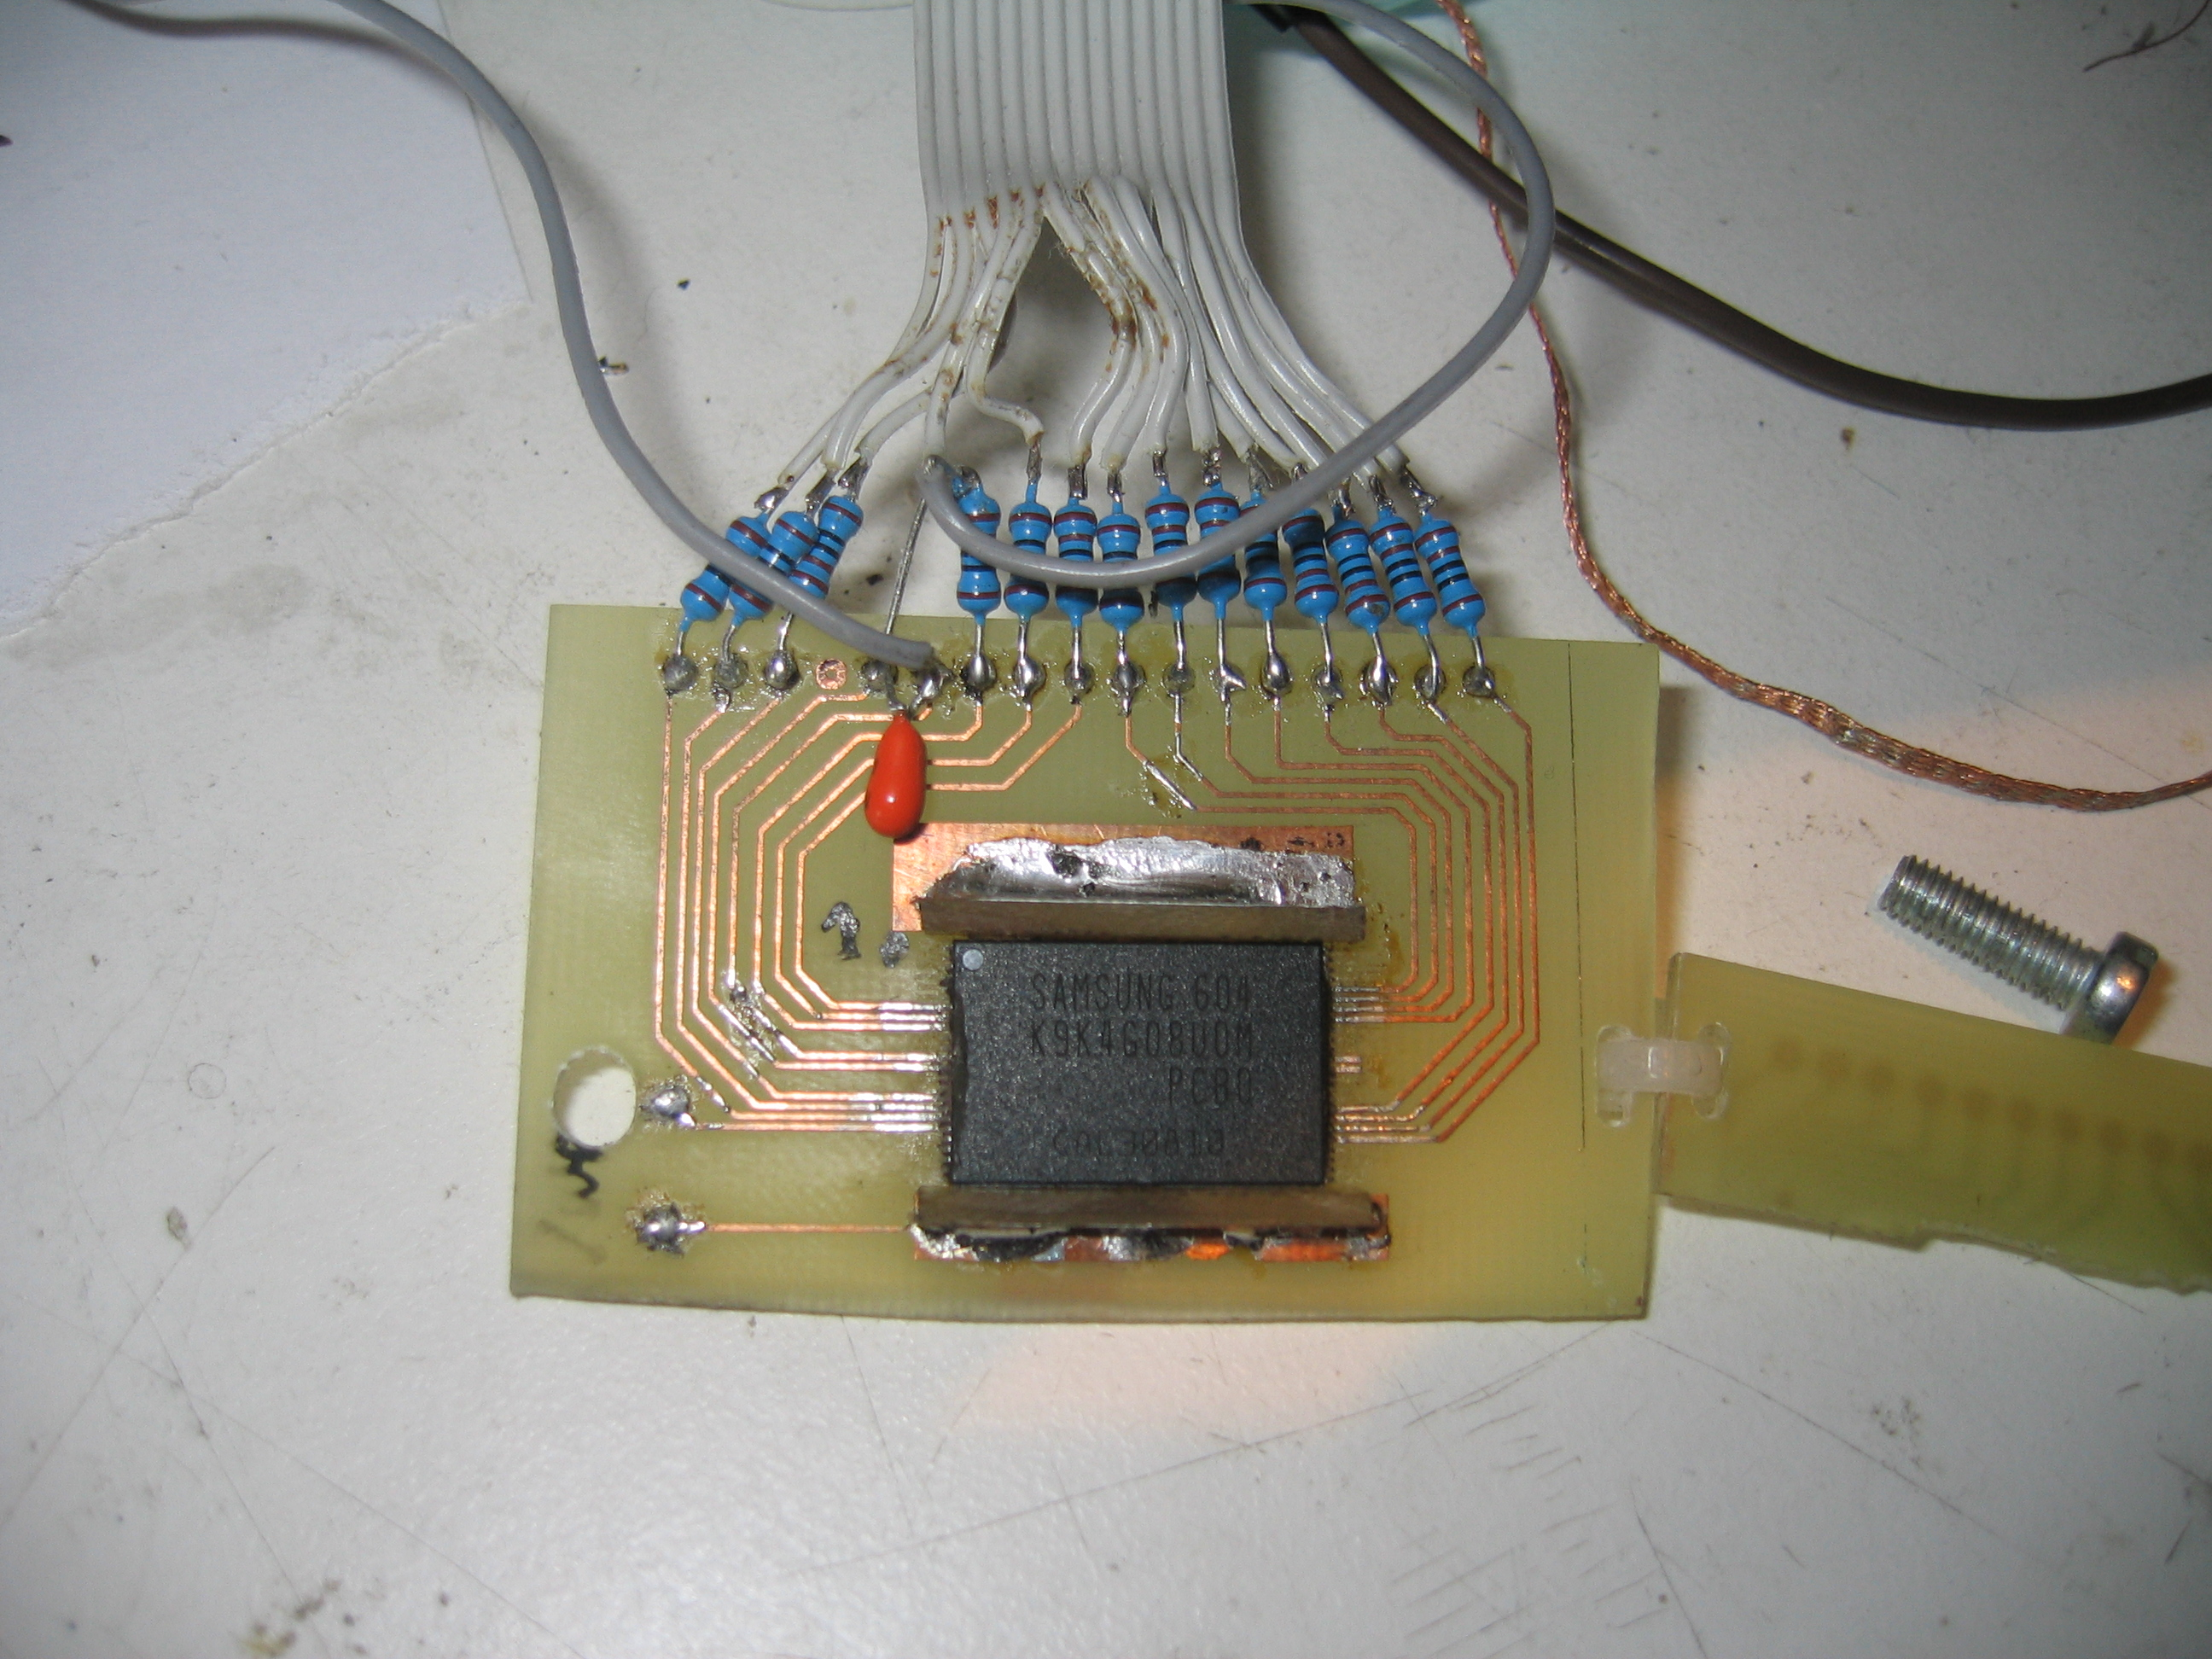 One nand программатор своими руками 827